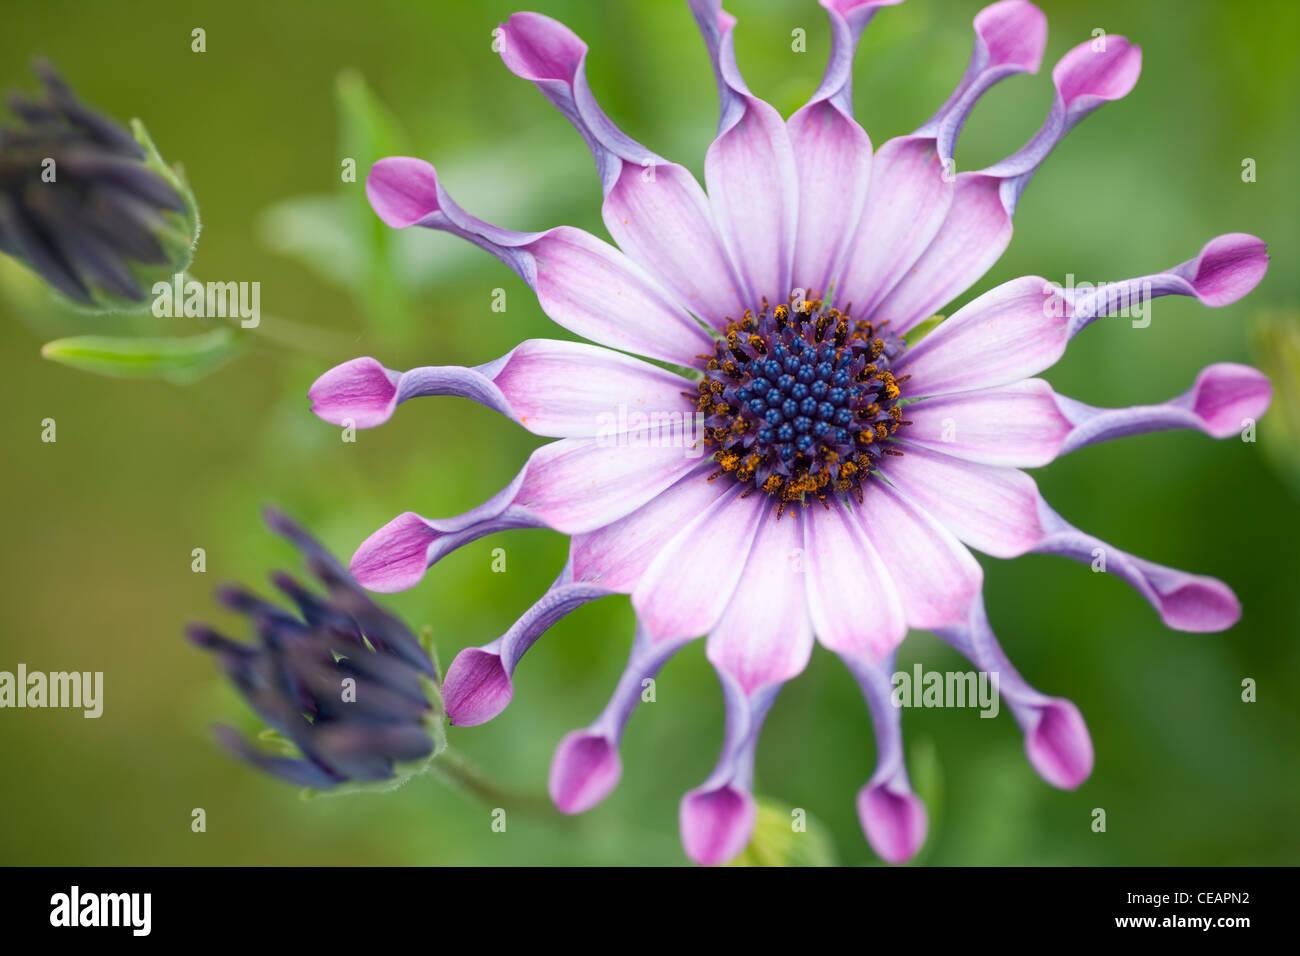 garden flowers uk serenity osteospermum pink p or. Black Bedroom Furniture Sets. Home Design Ideas